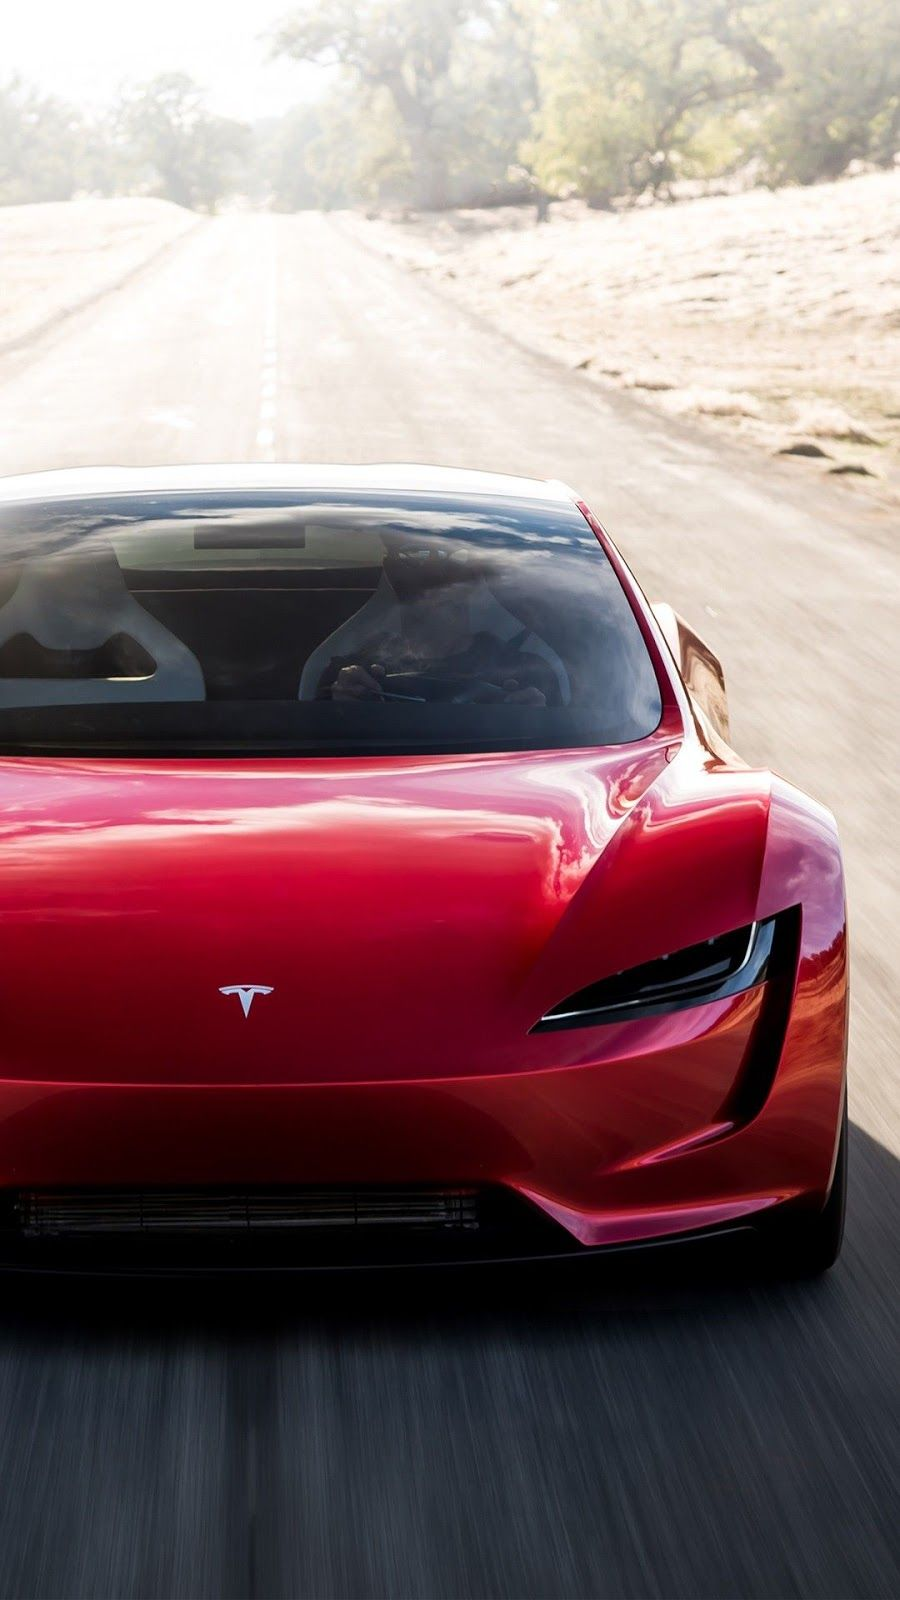 Tesla Roadster 2020 Super Cars In 2020 Tesla Roadster Luxury Cars Affordable Sports Cars